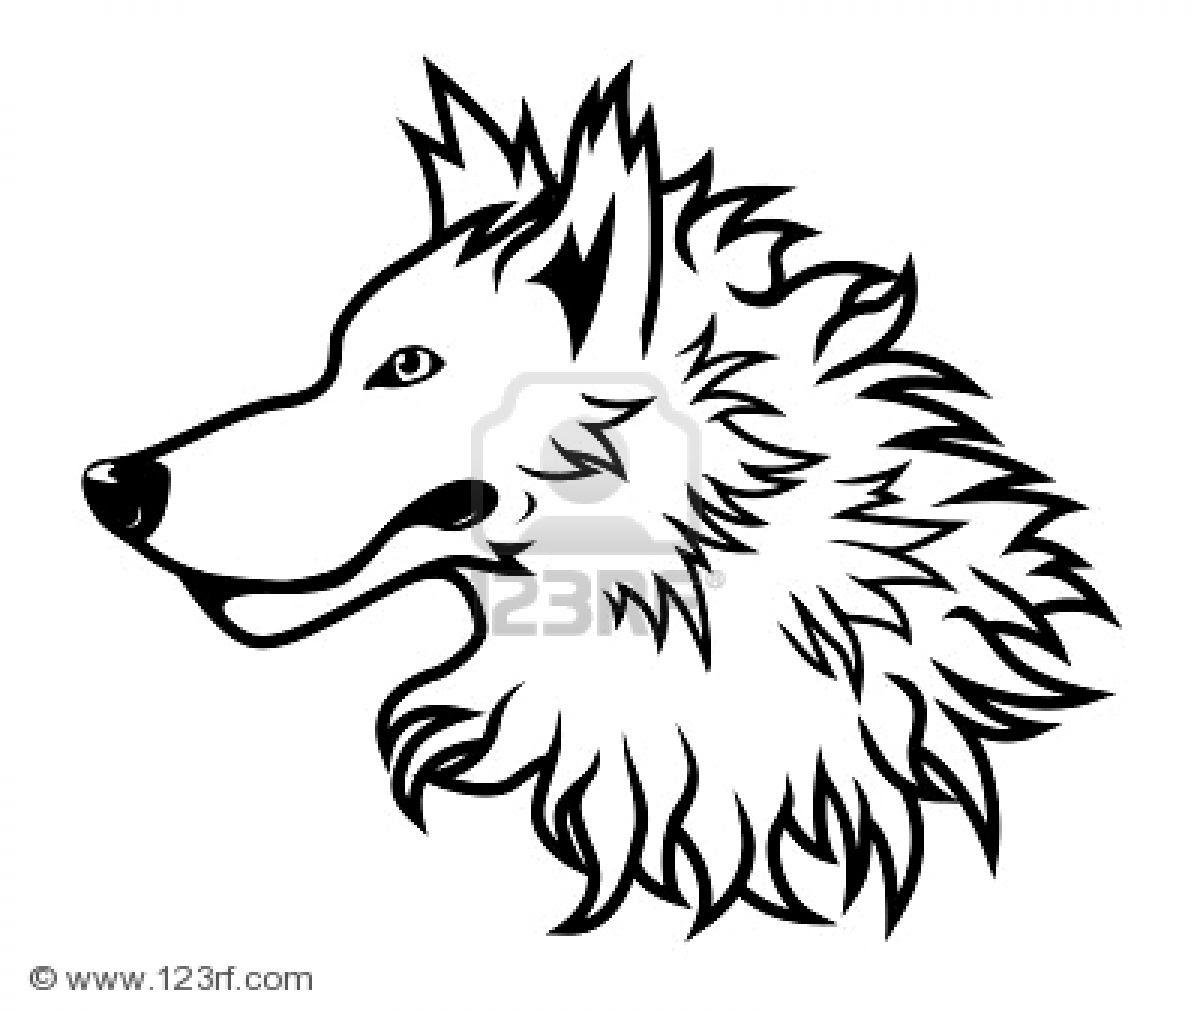 Dibujos De Lobos Dibujos